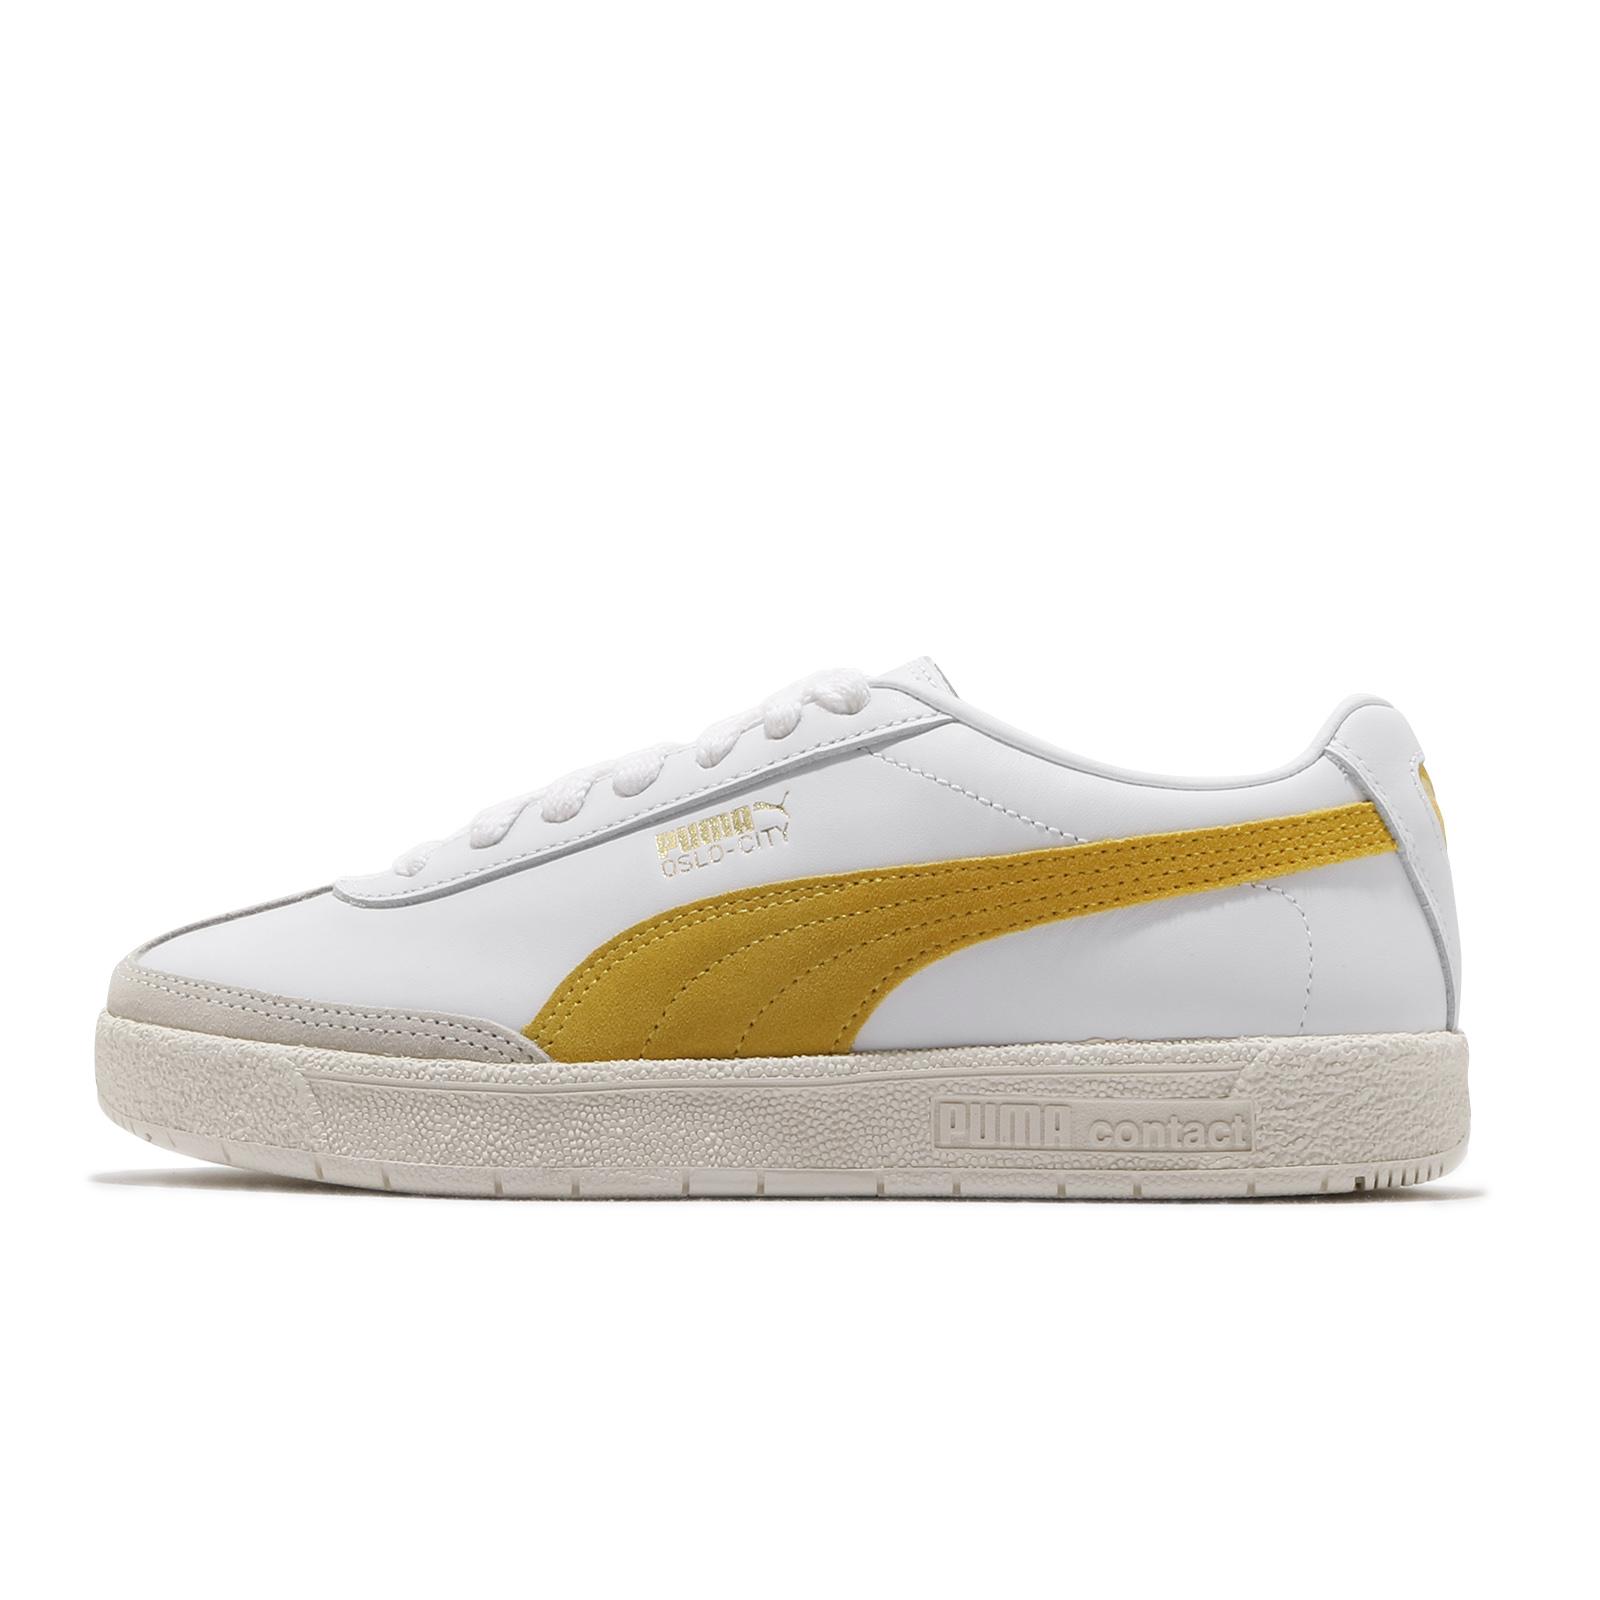 Puma 休閒鞋 Oslo-City PRM 白 黃 男鞋 女鞋 復古 網球鞋 多功能鞋 【ACS】 374800-01